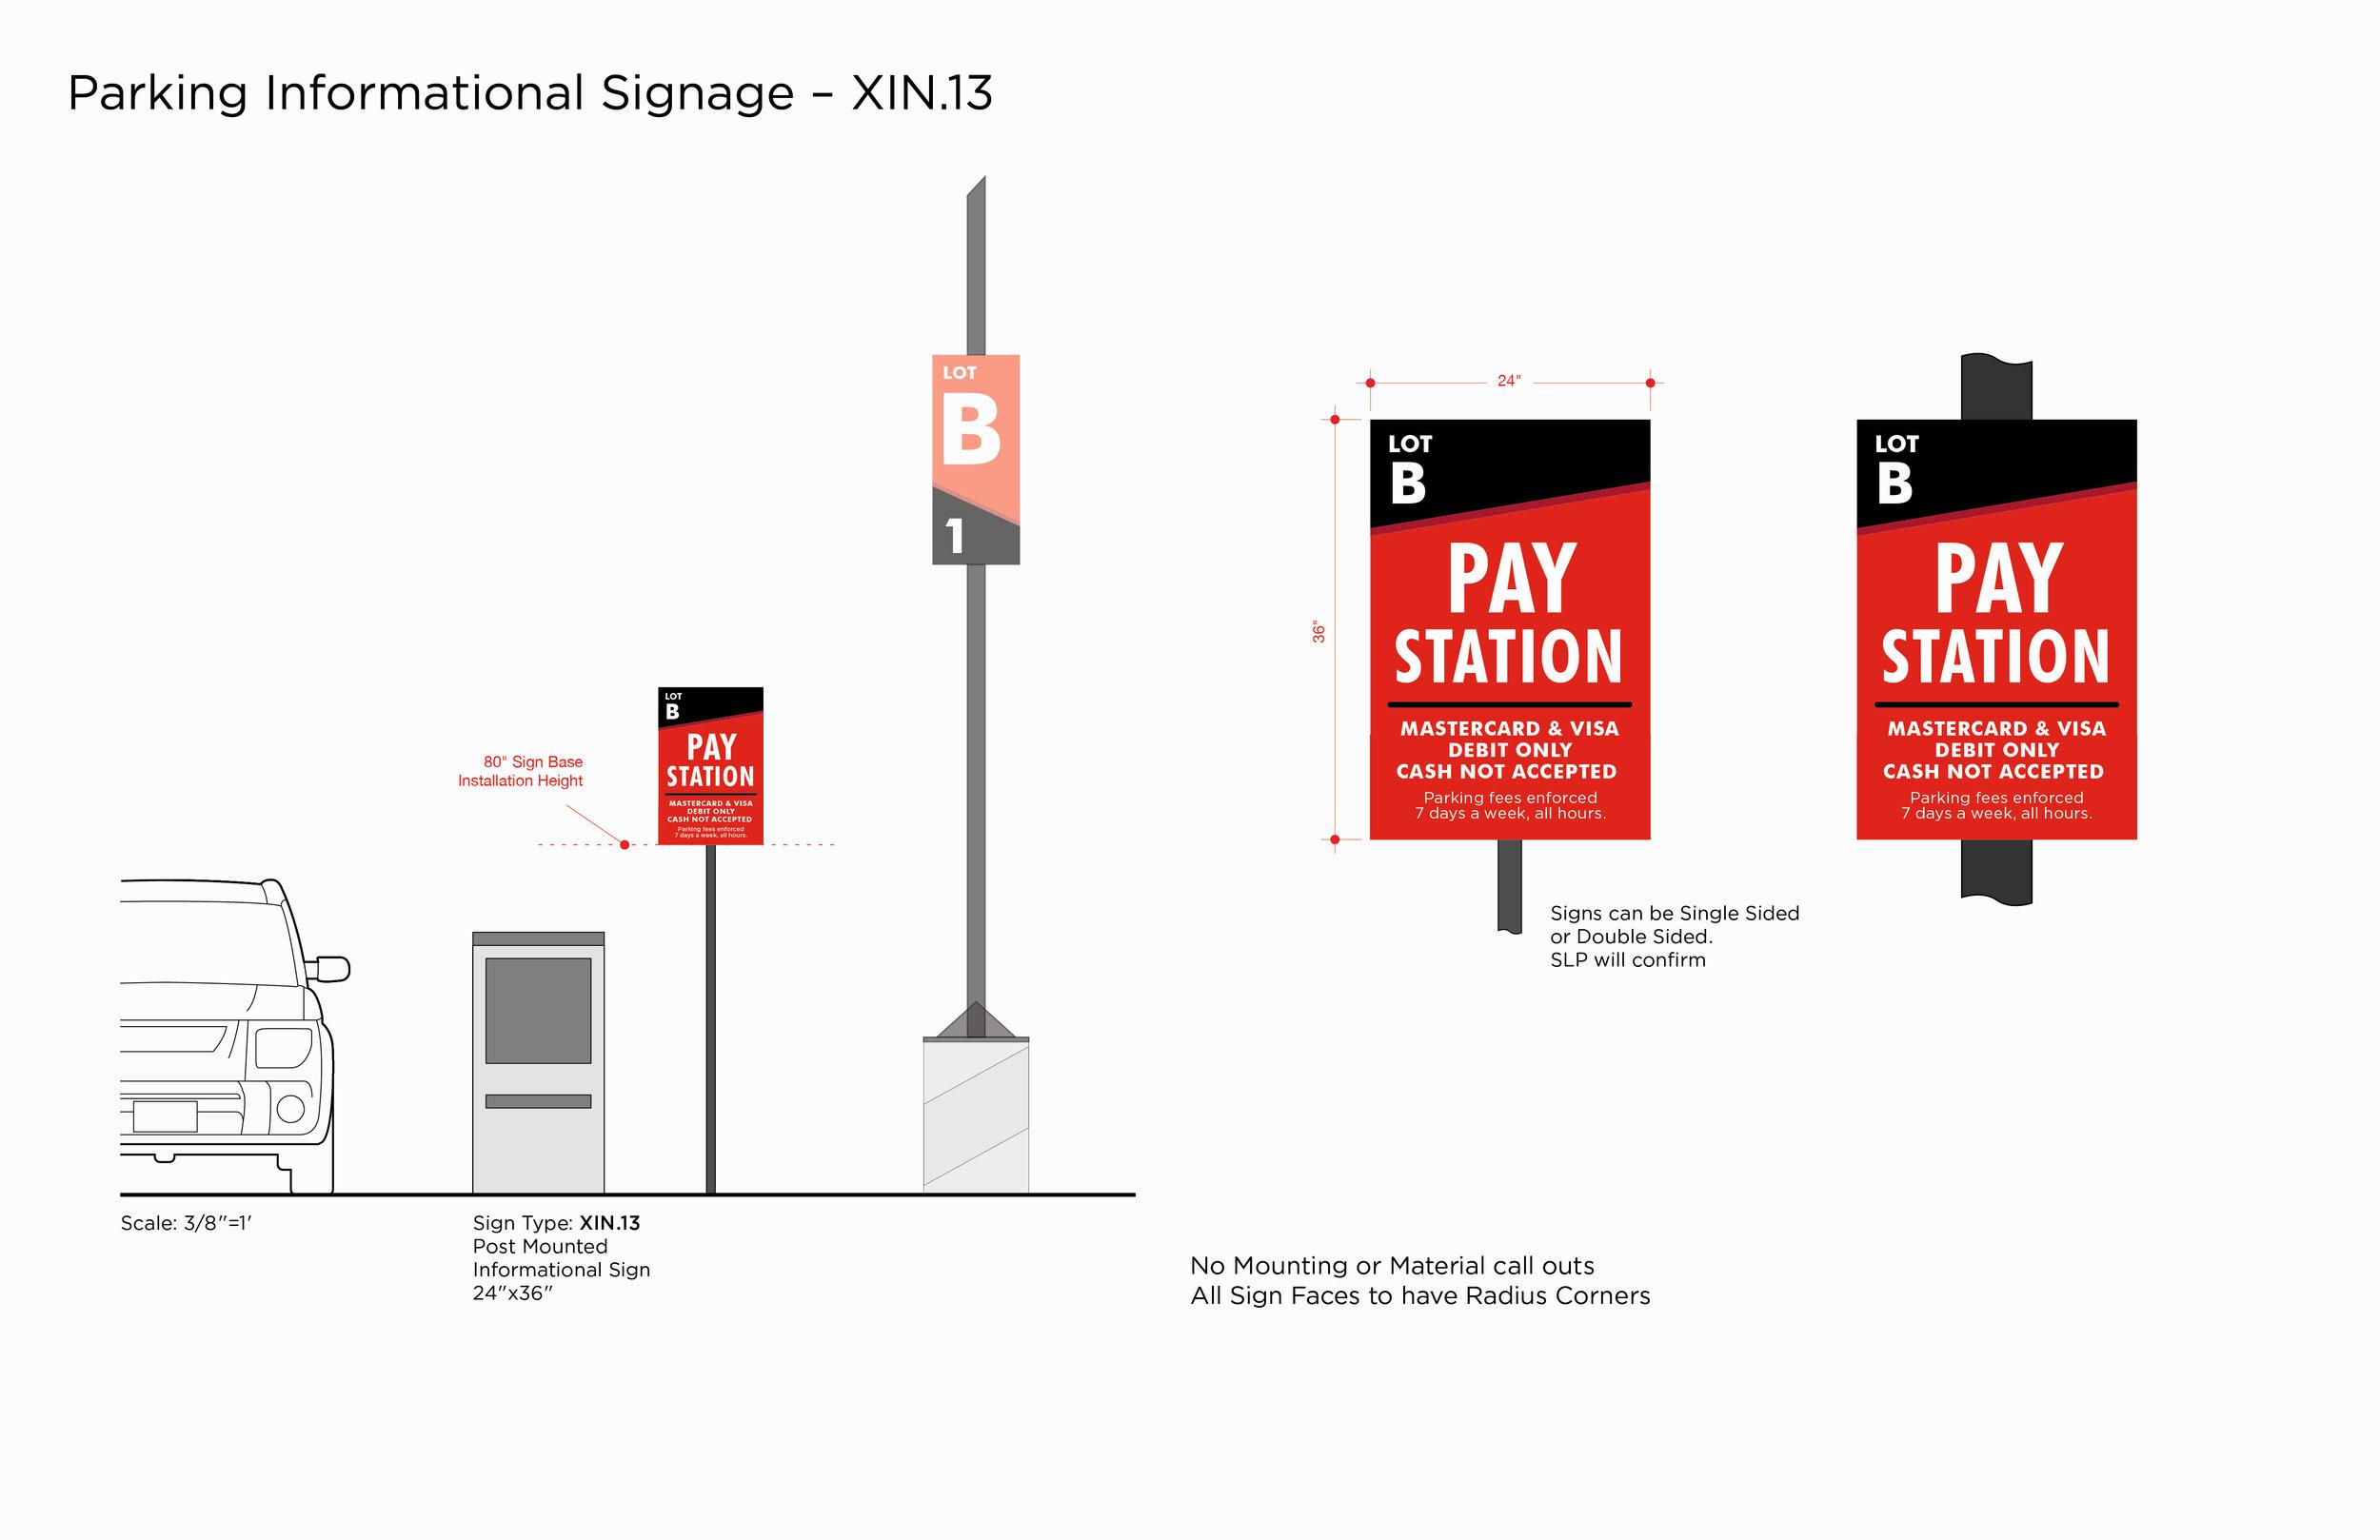 CCSF_ParkingLot_2017_01319.jpg